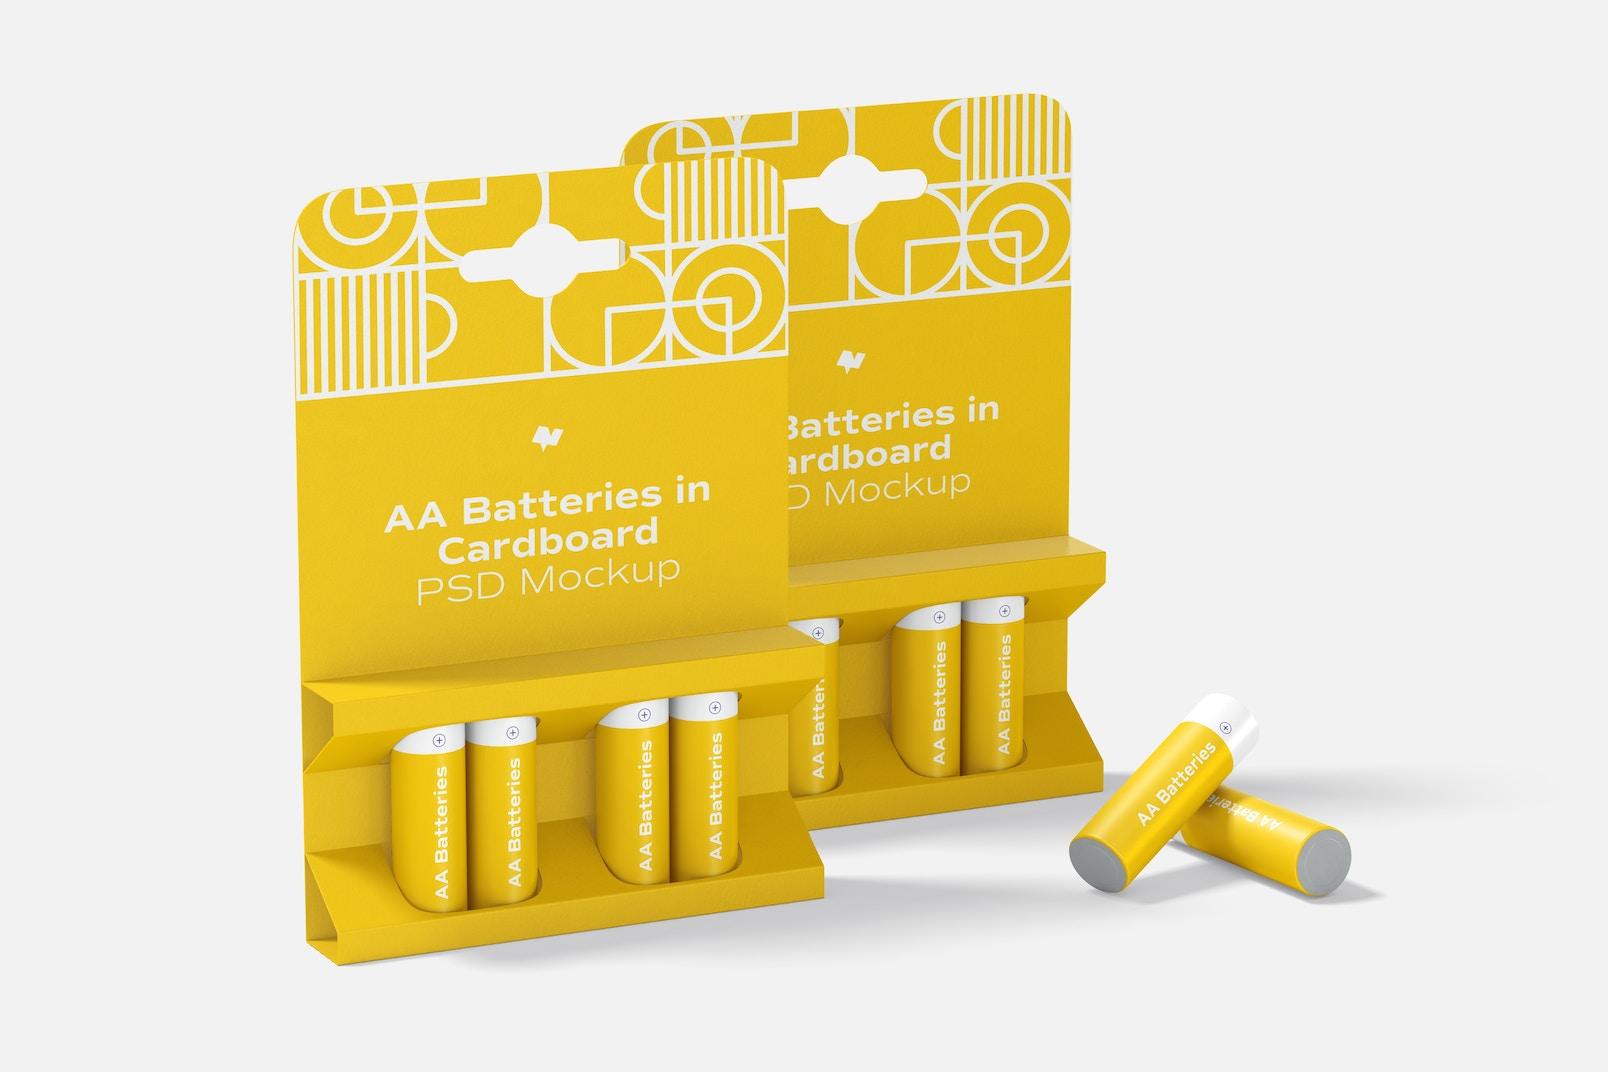 AA Batteries in Cardboard Mockup, Perspective